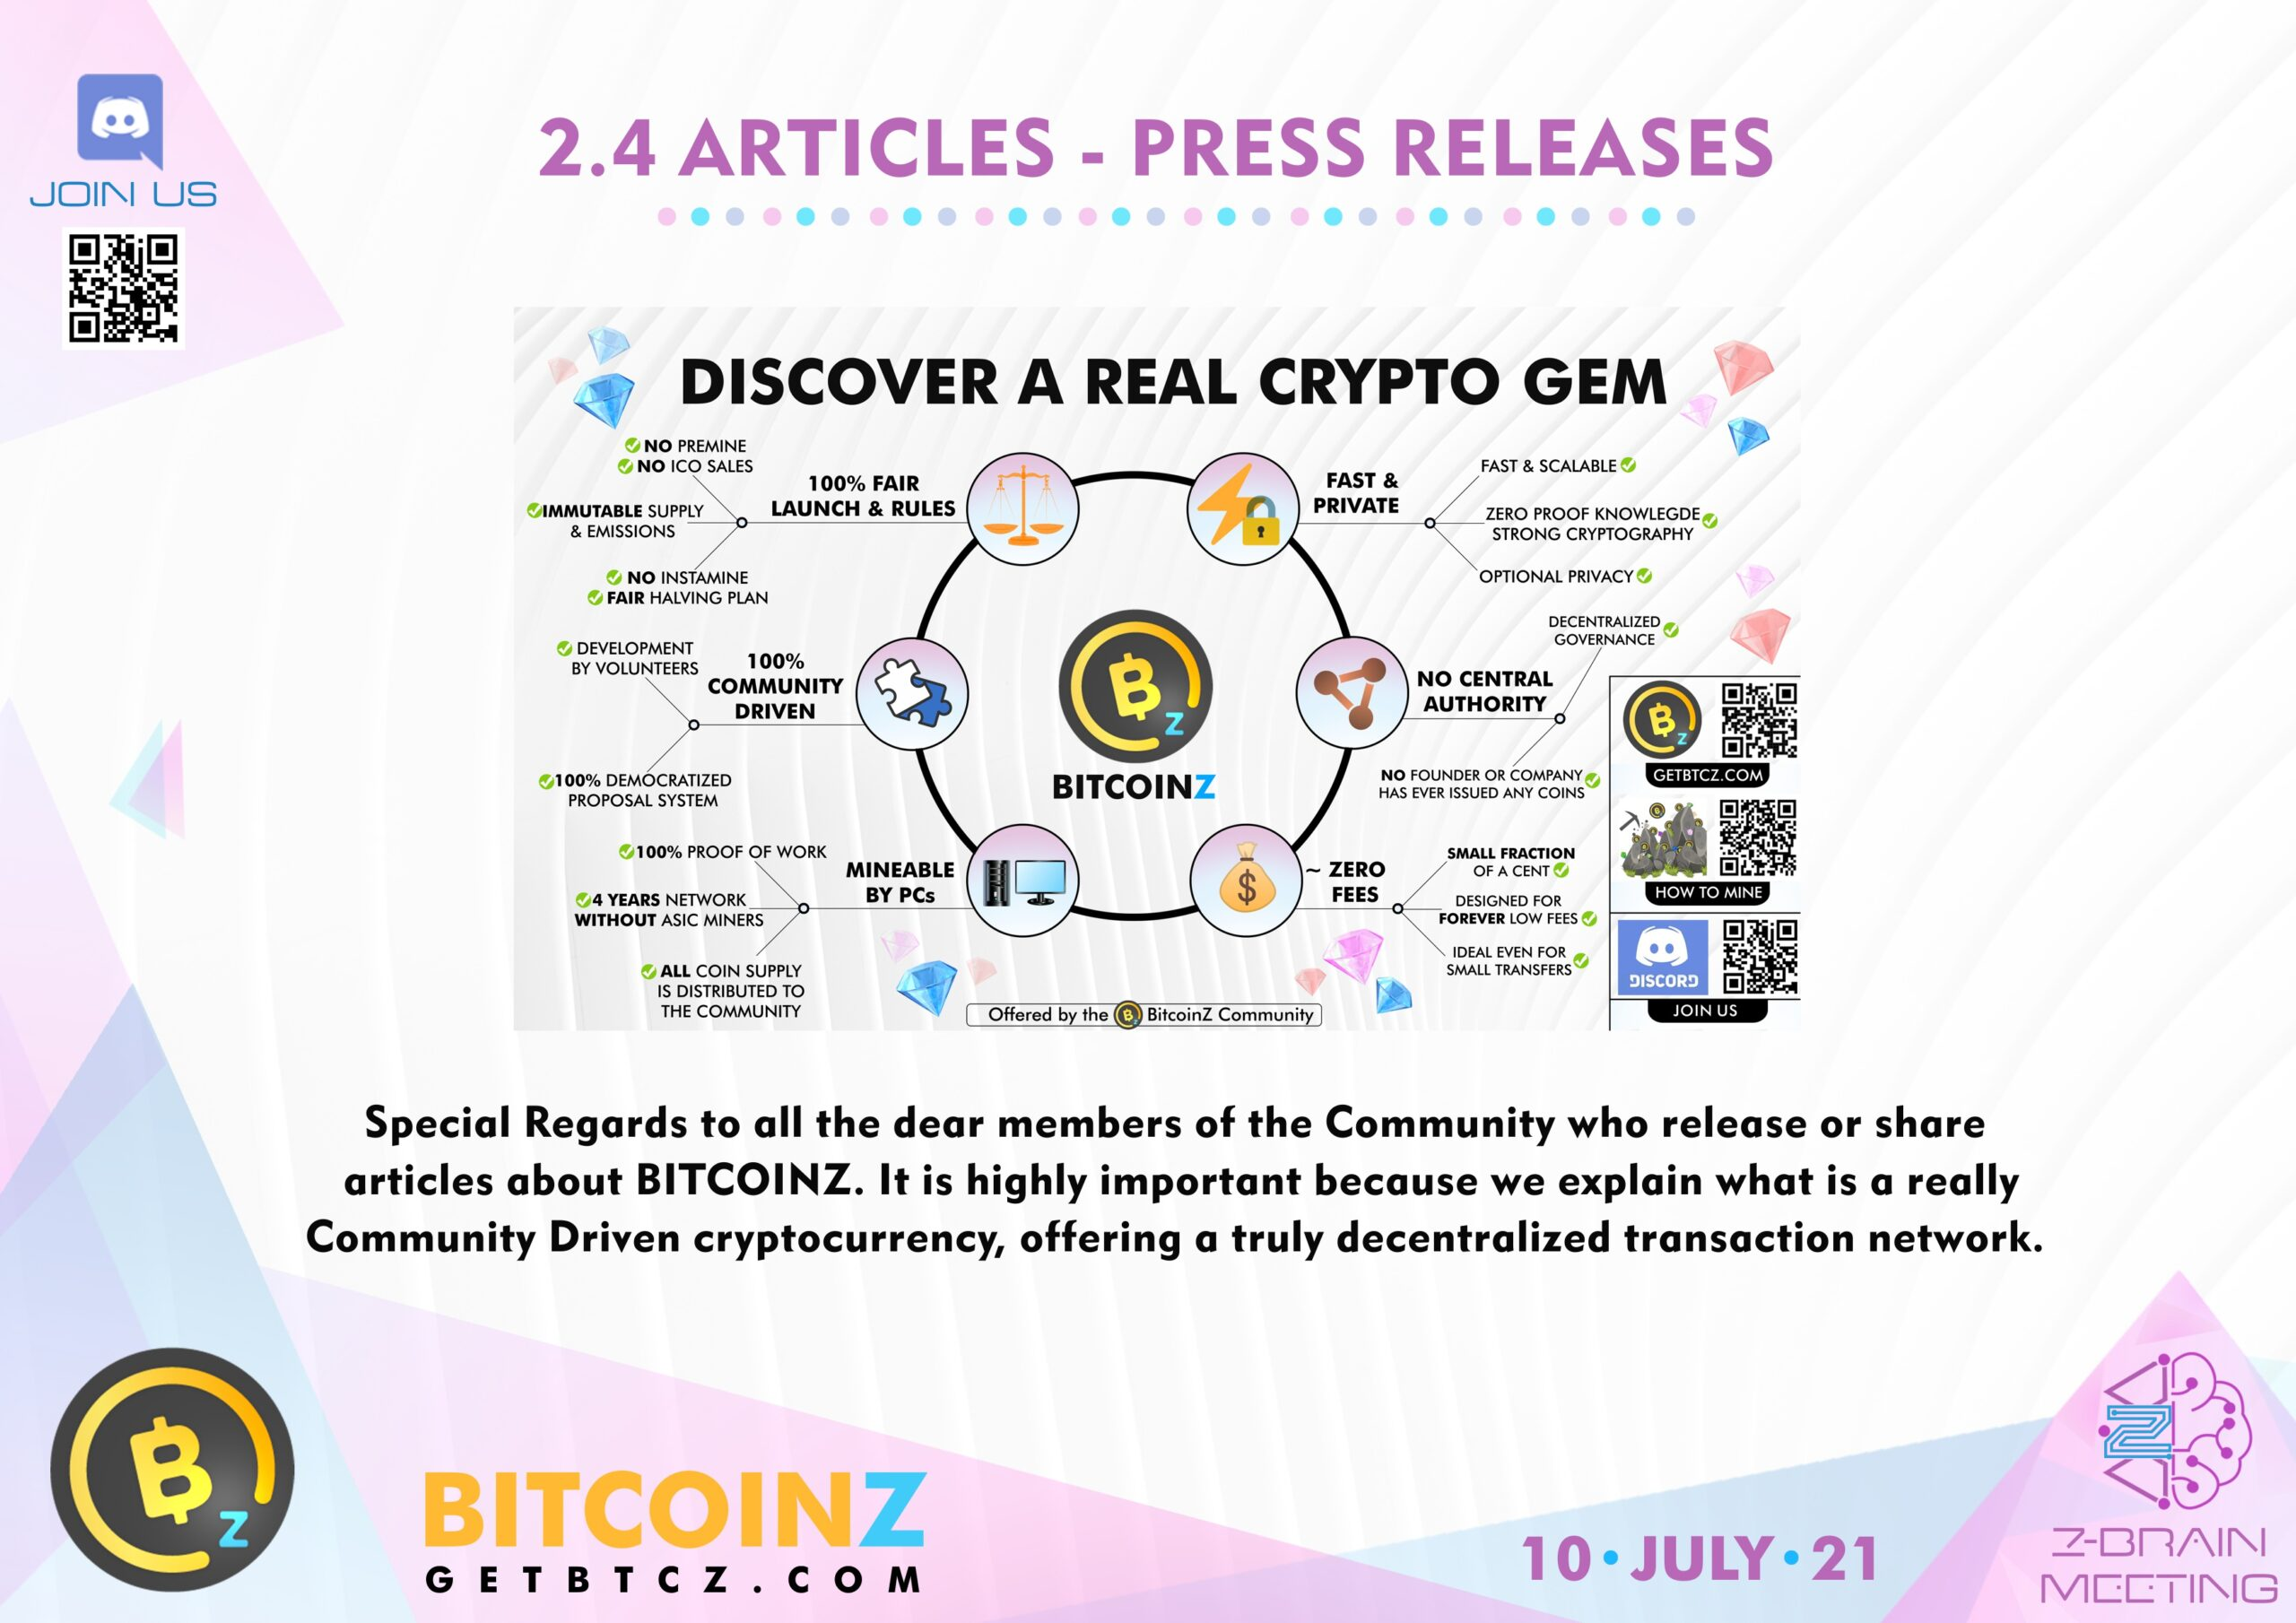 Press Releases BITCOINZ